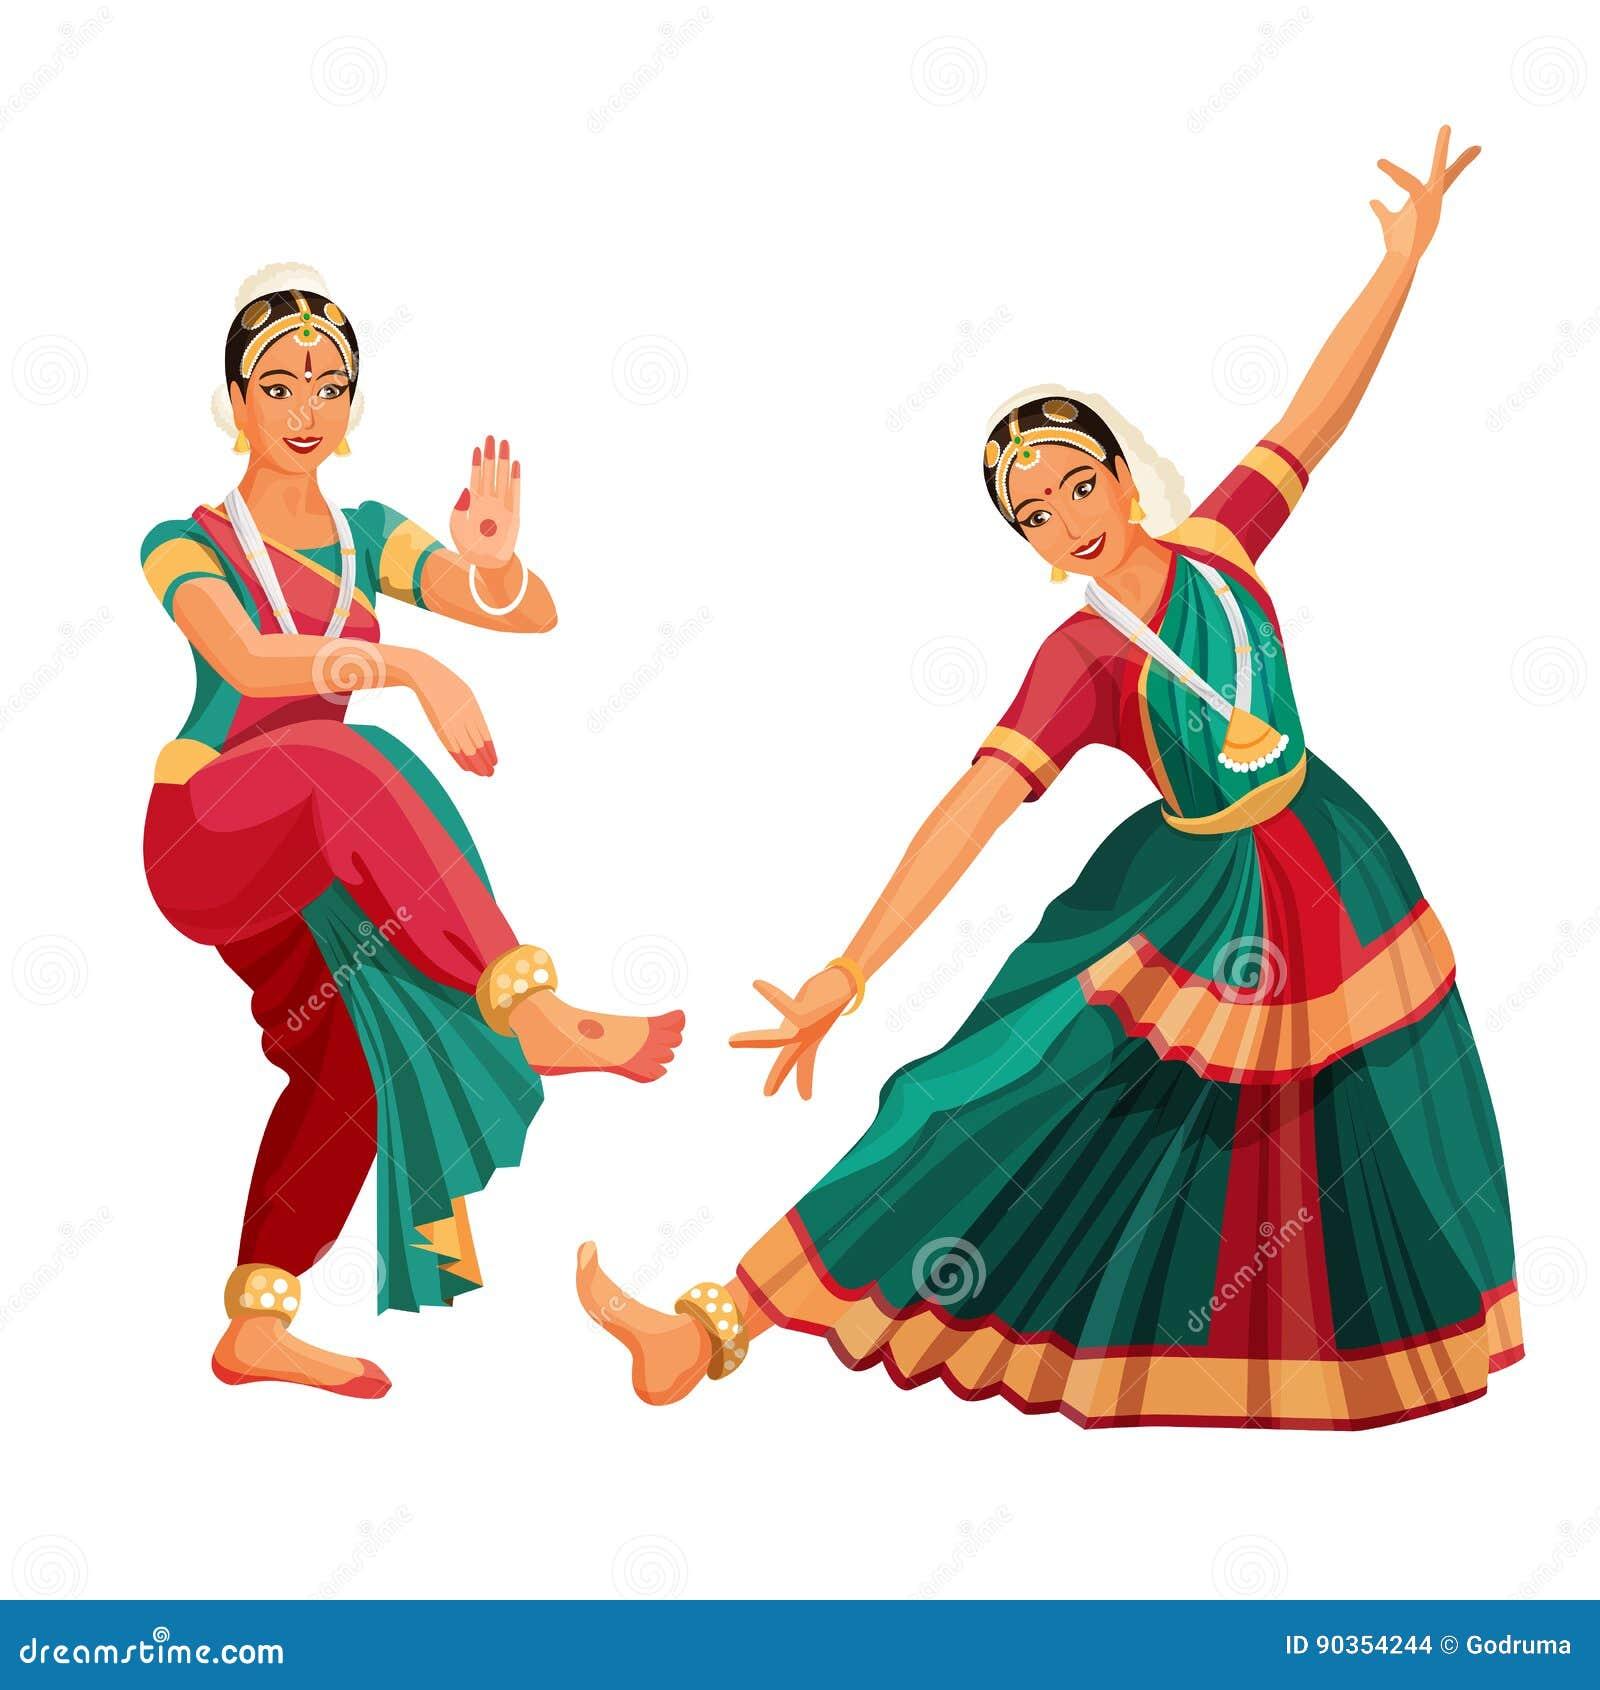 Woman Dancer In National Indian Cloth Dancing Bharatanatyam Folk Dance Stock Vector Illustration Of Bharatanatyam Ethnicity 90354244